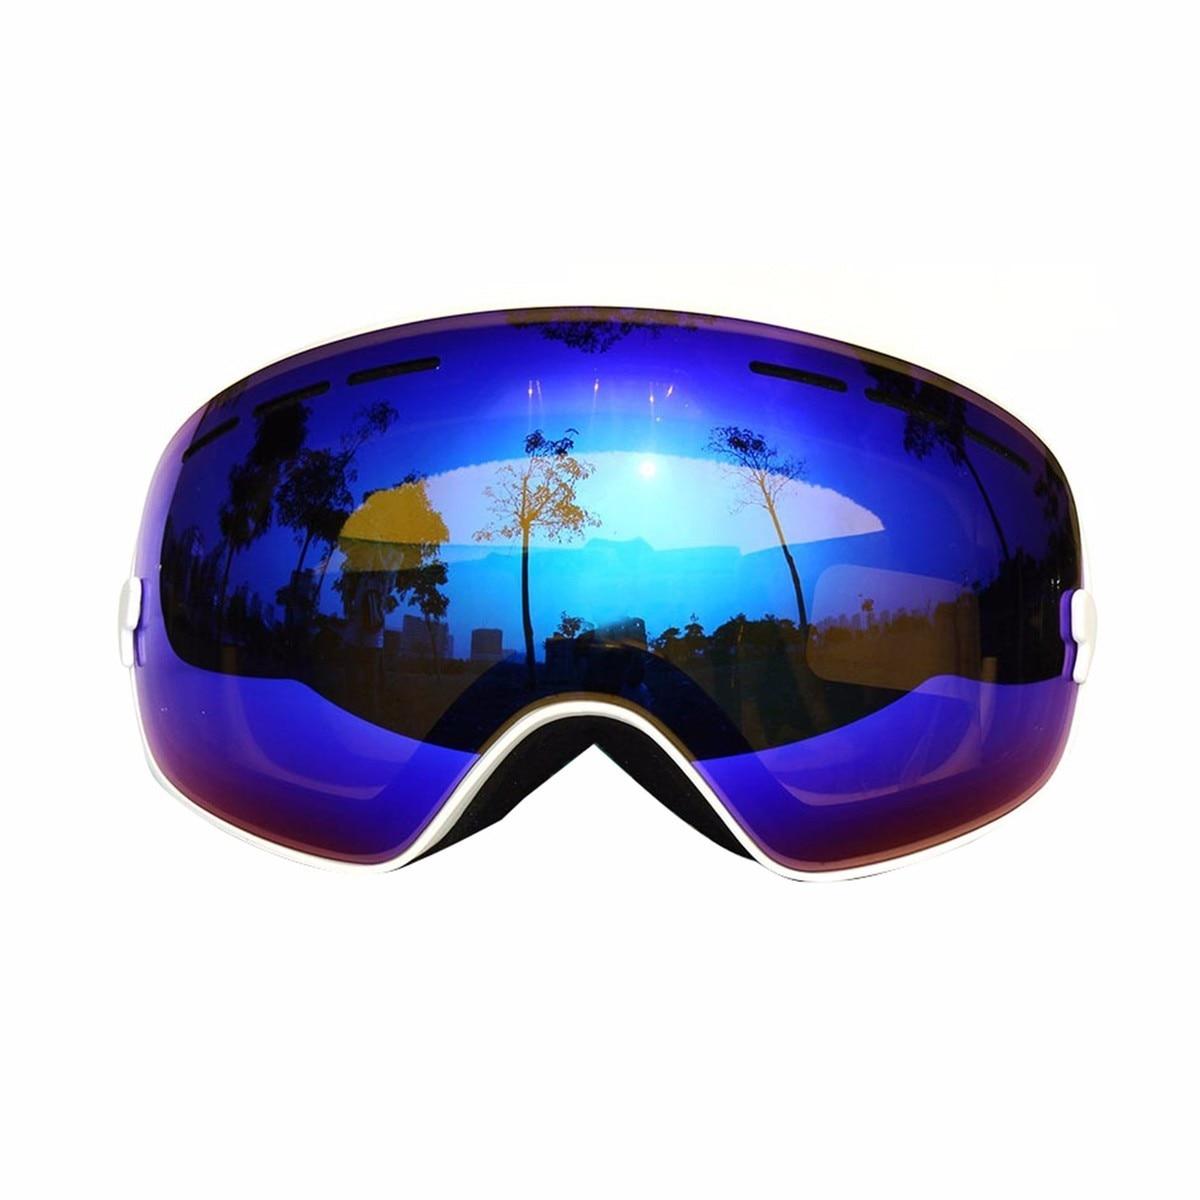 2017 COPOZZ Ski font b Snowboard b font Snow Goggles Skiing Eyewear Ski Glasses Motocross font